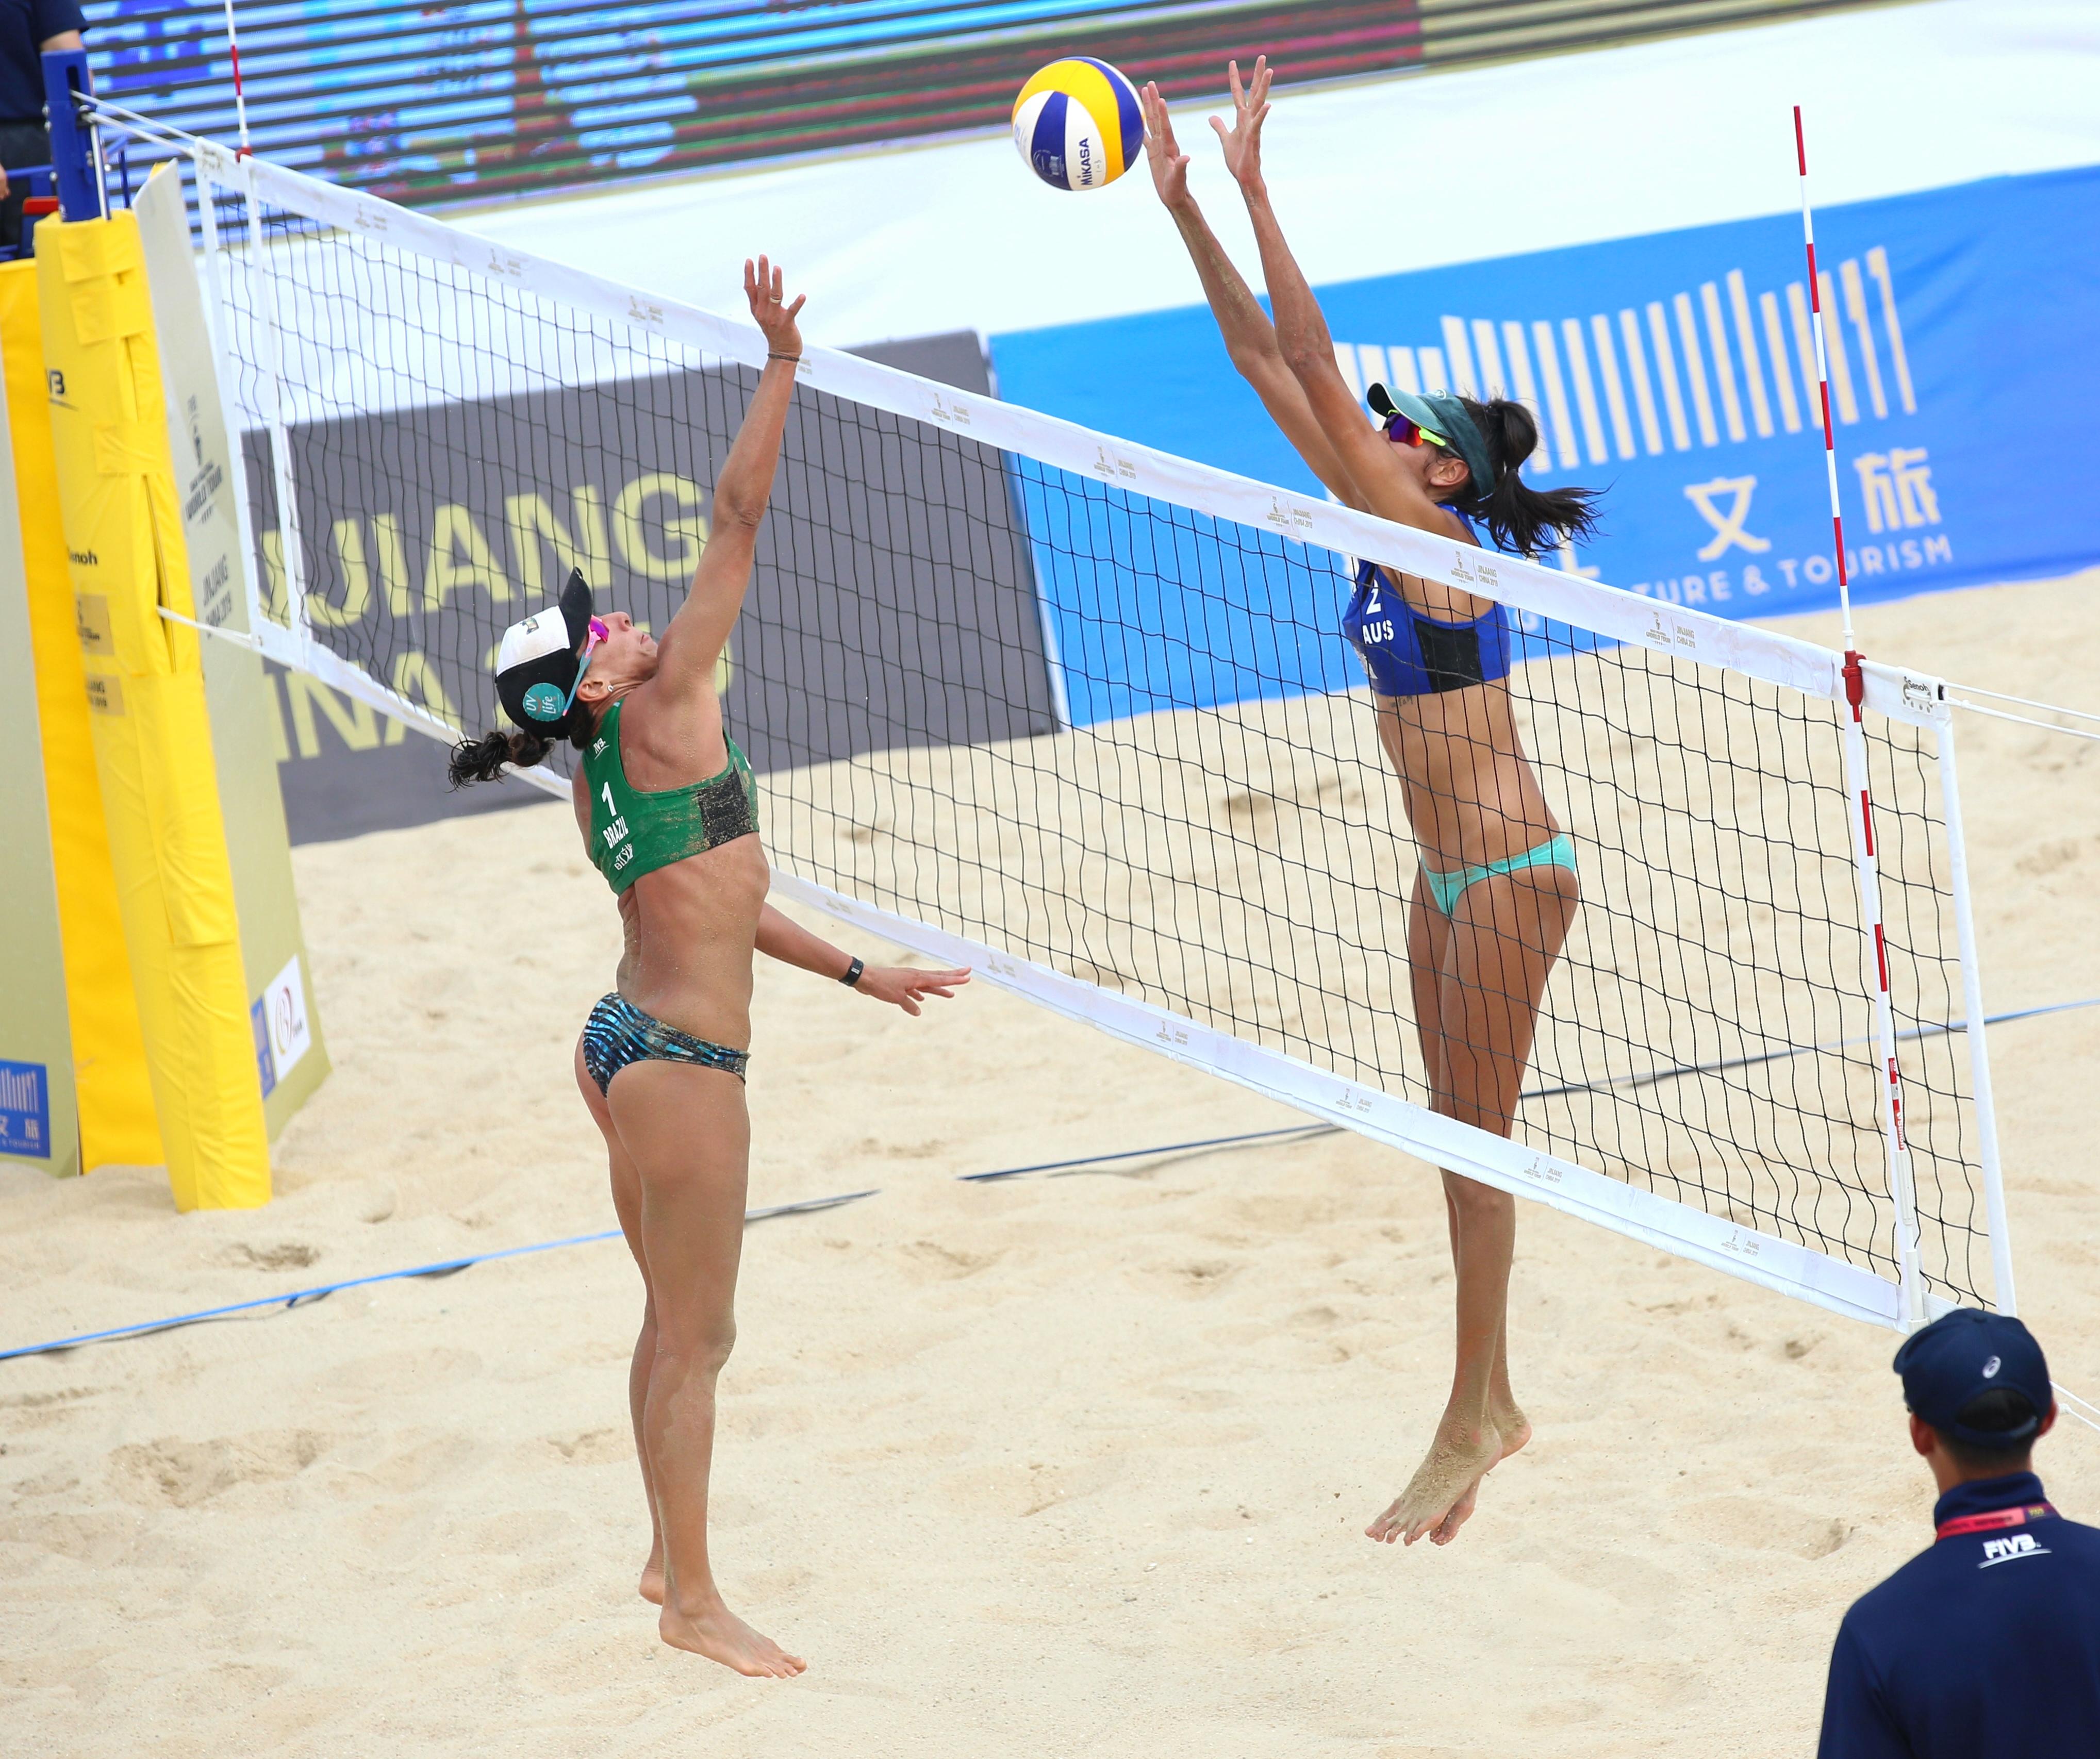 News - Clancy & Artacho face Ana Patricia & Rebecca in Jinjiang semifinal